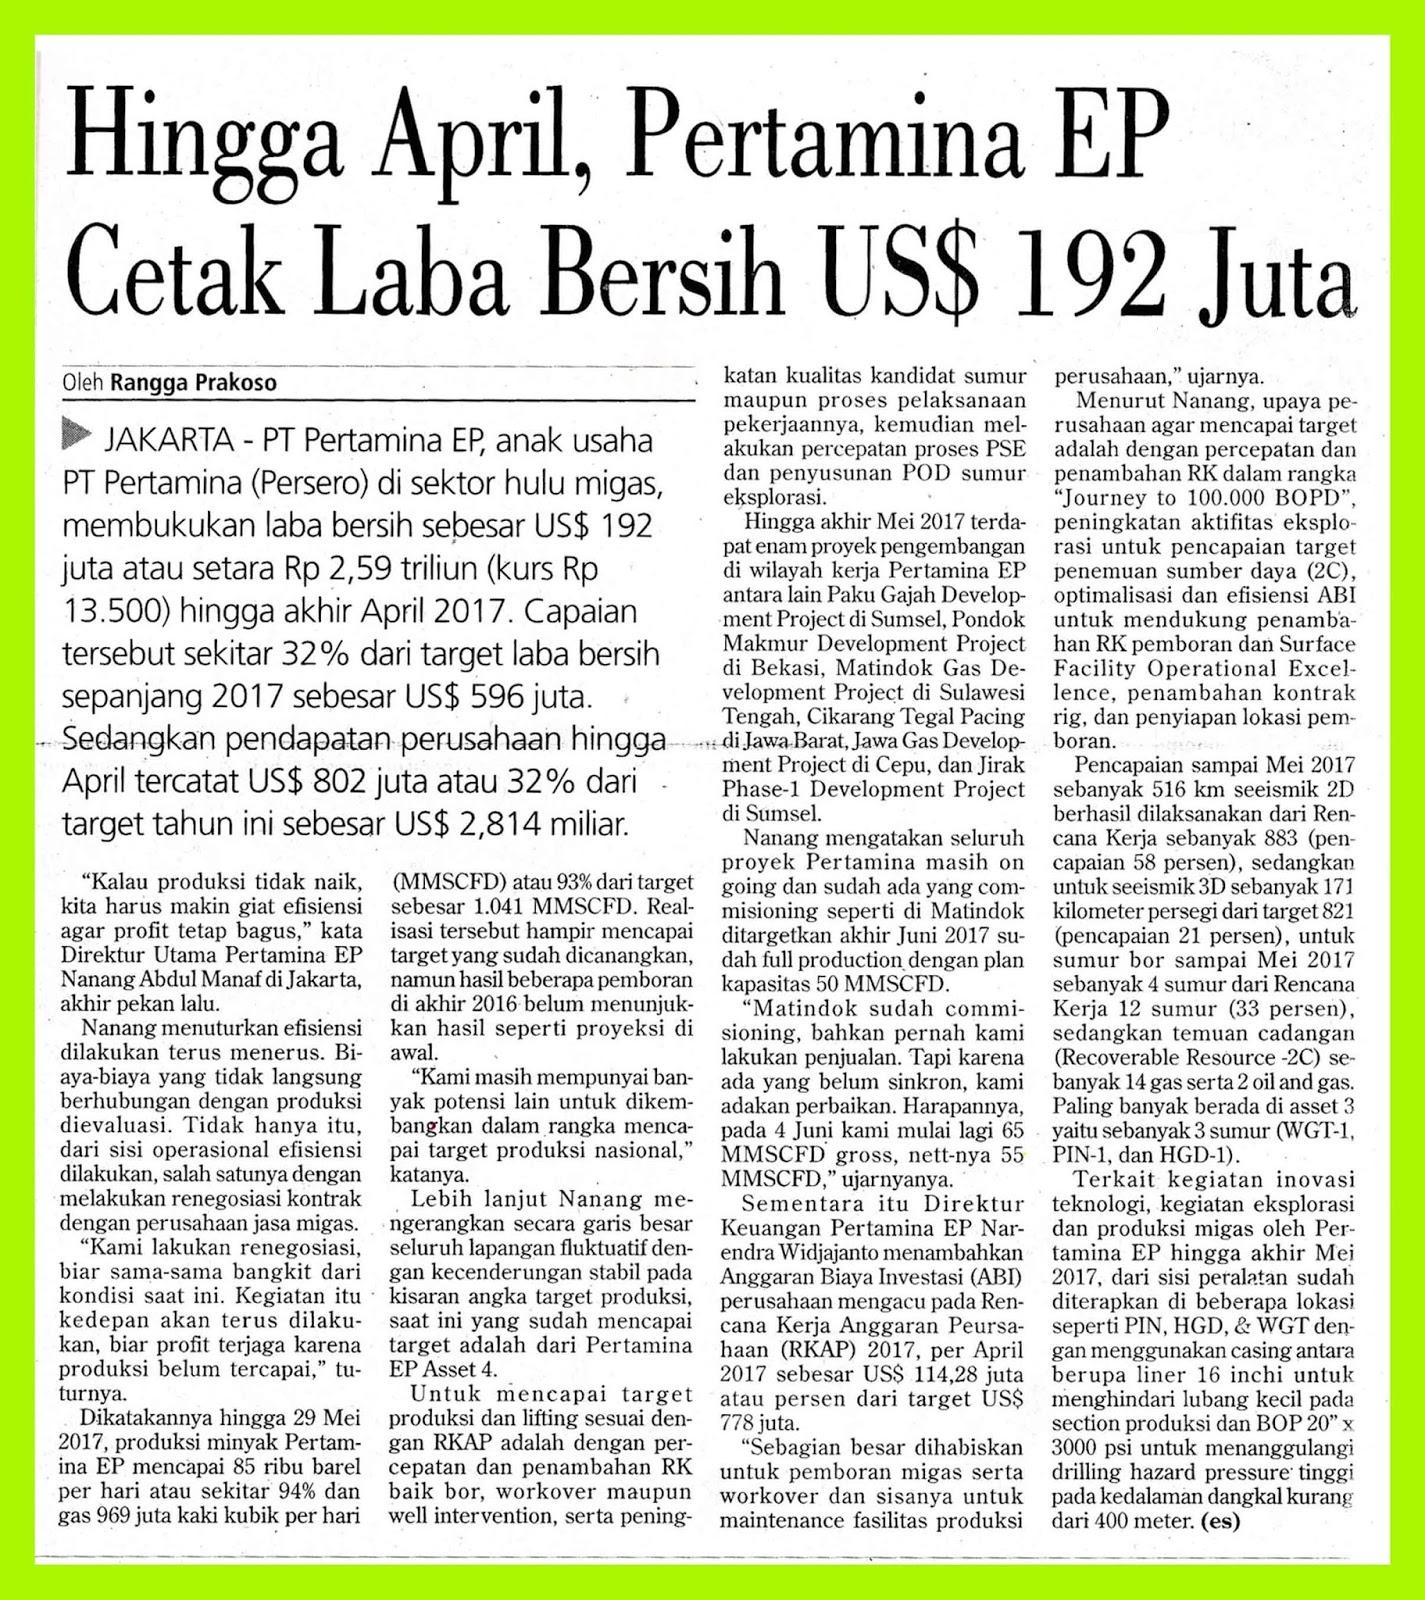 Until April, Pertamina EP Prints Net Profit of US $ 192 Million